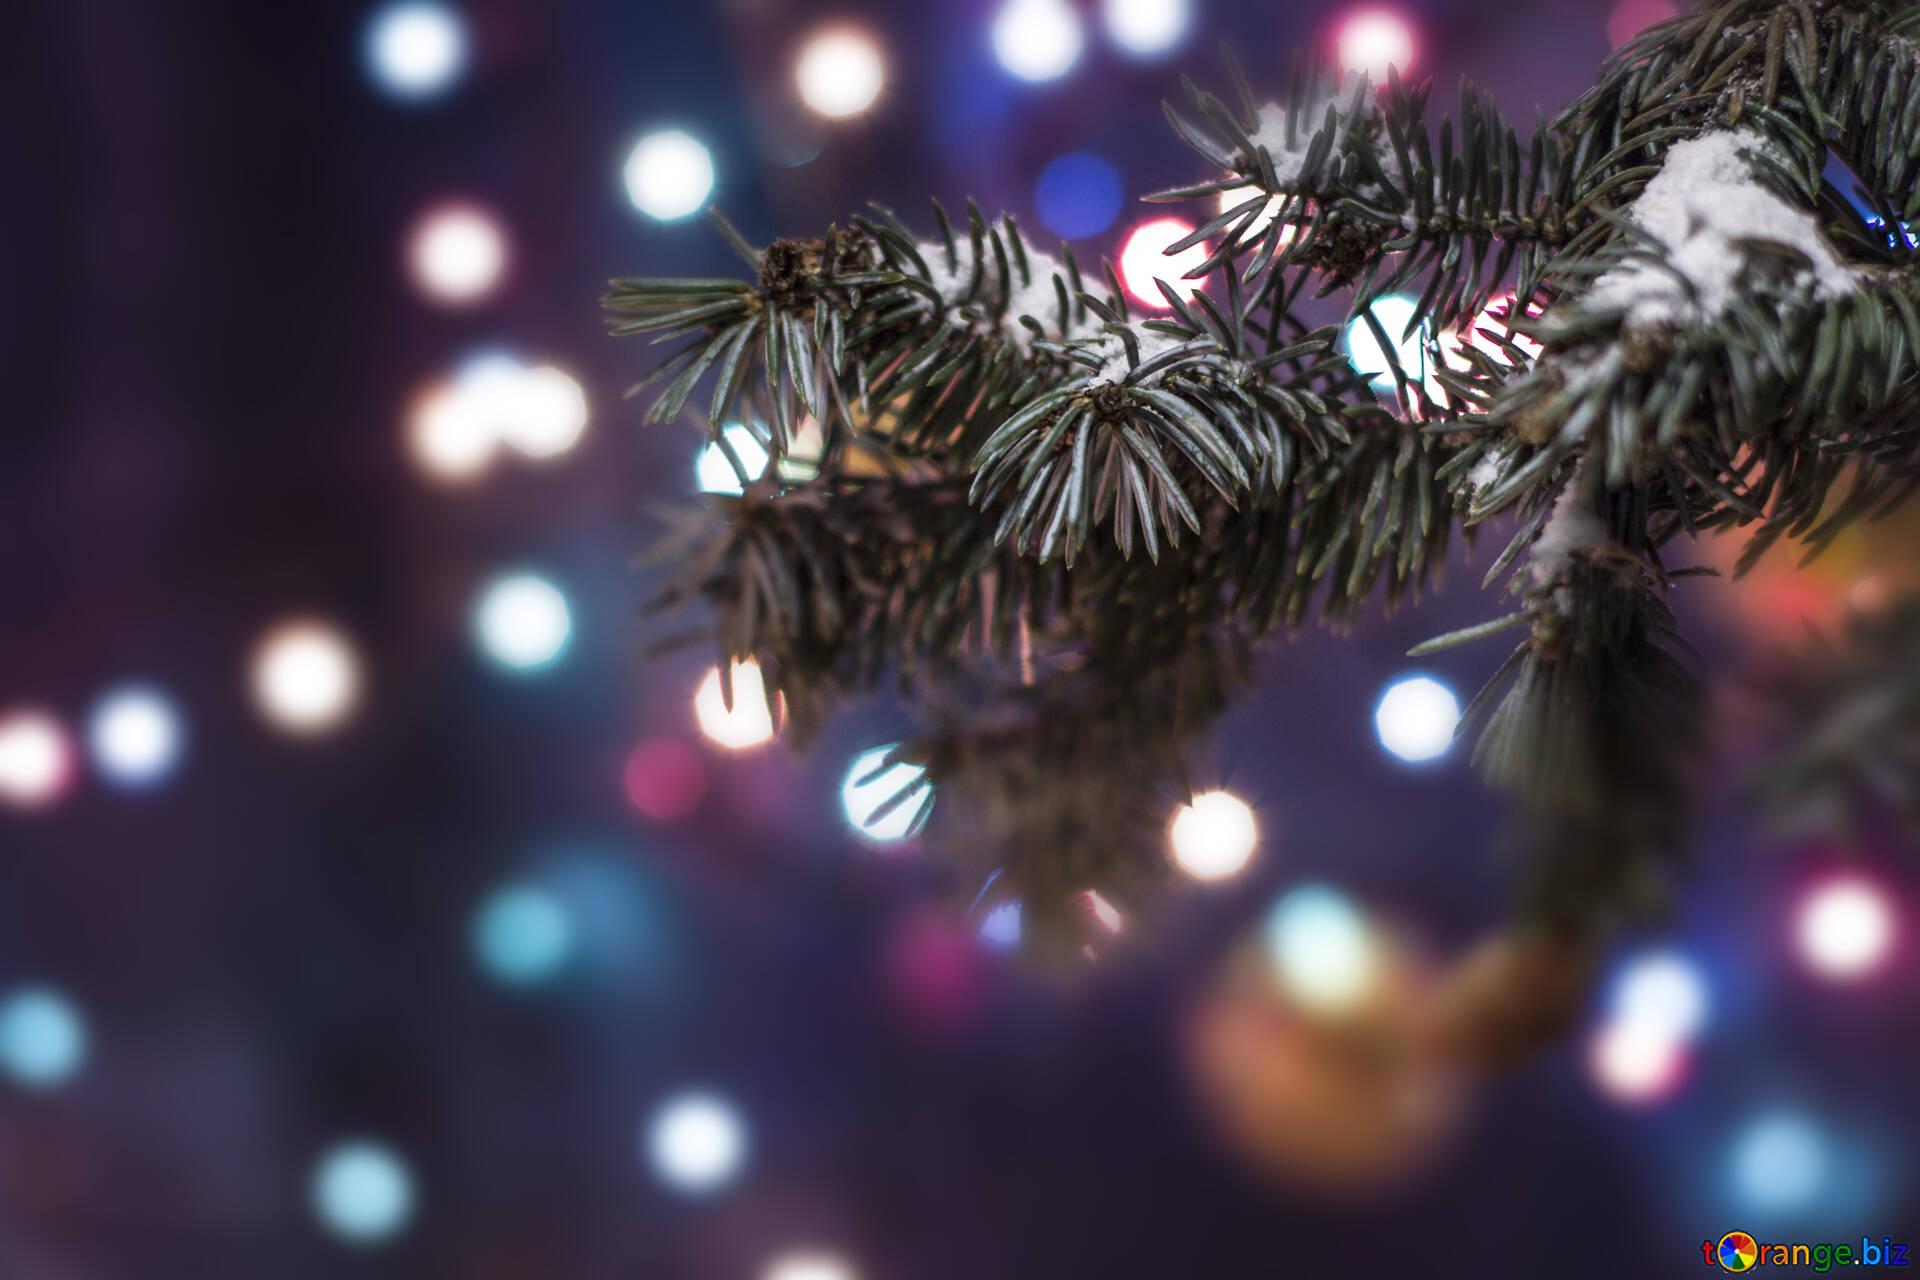 New Year Desktop Wallpapers Image Christmas Desktop Images Clipart 15314 Torange Biz Free Pics On Cc By License